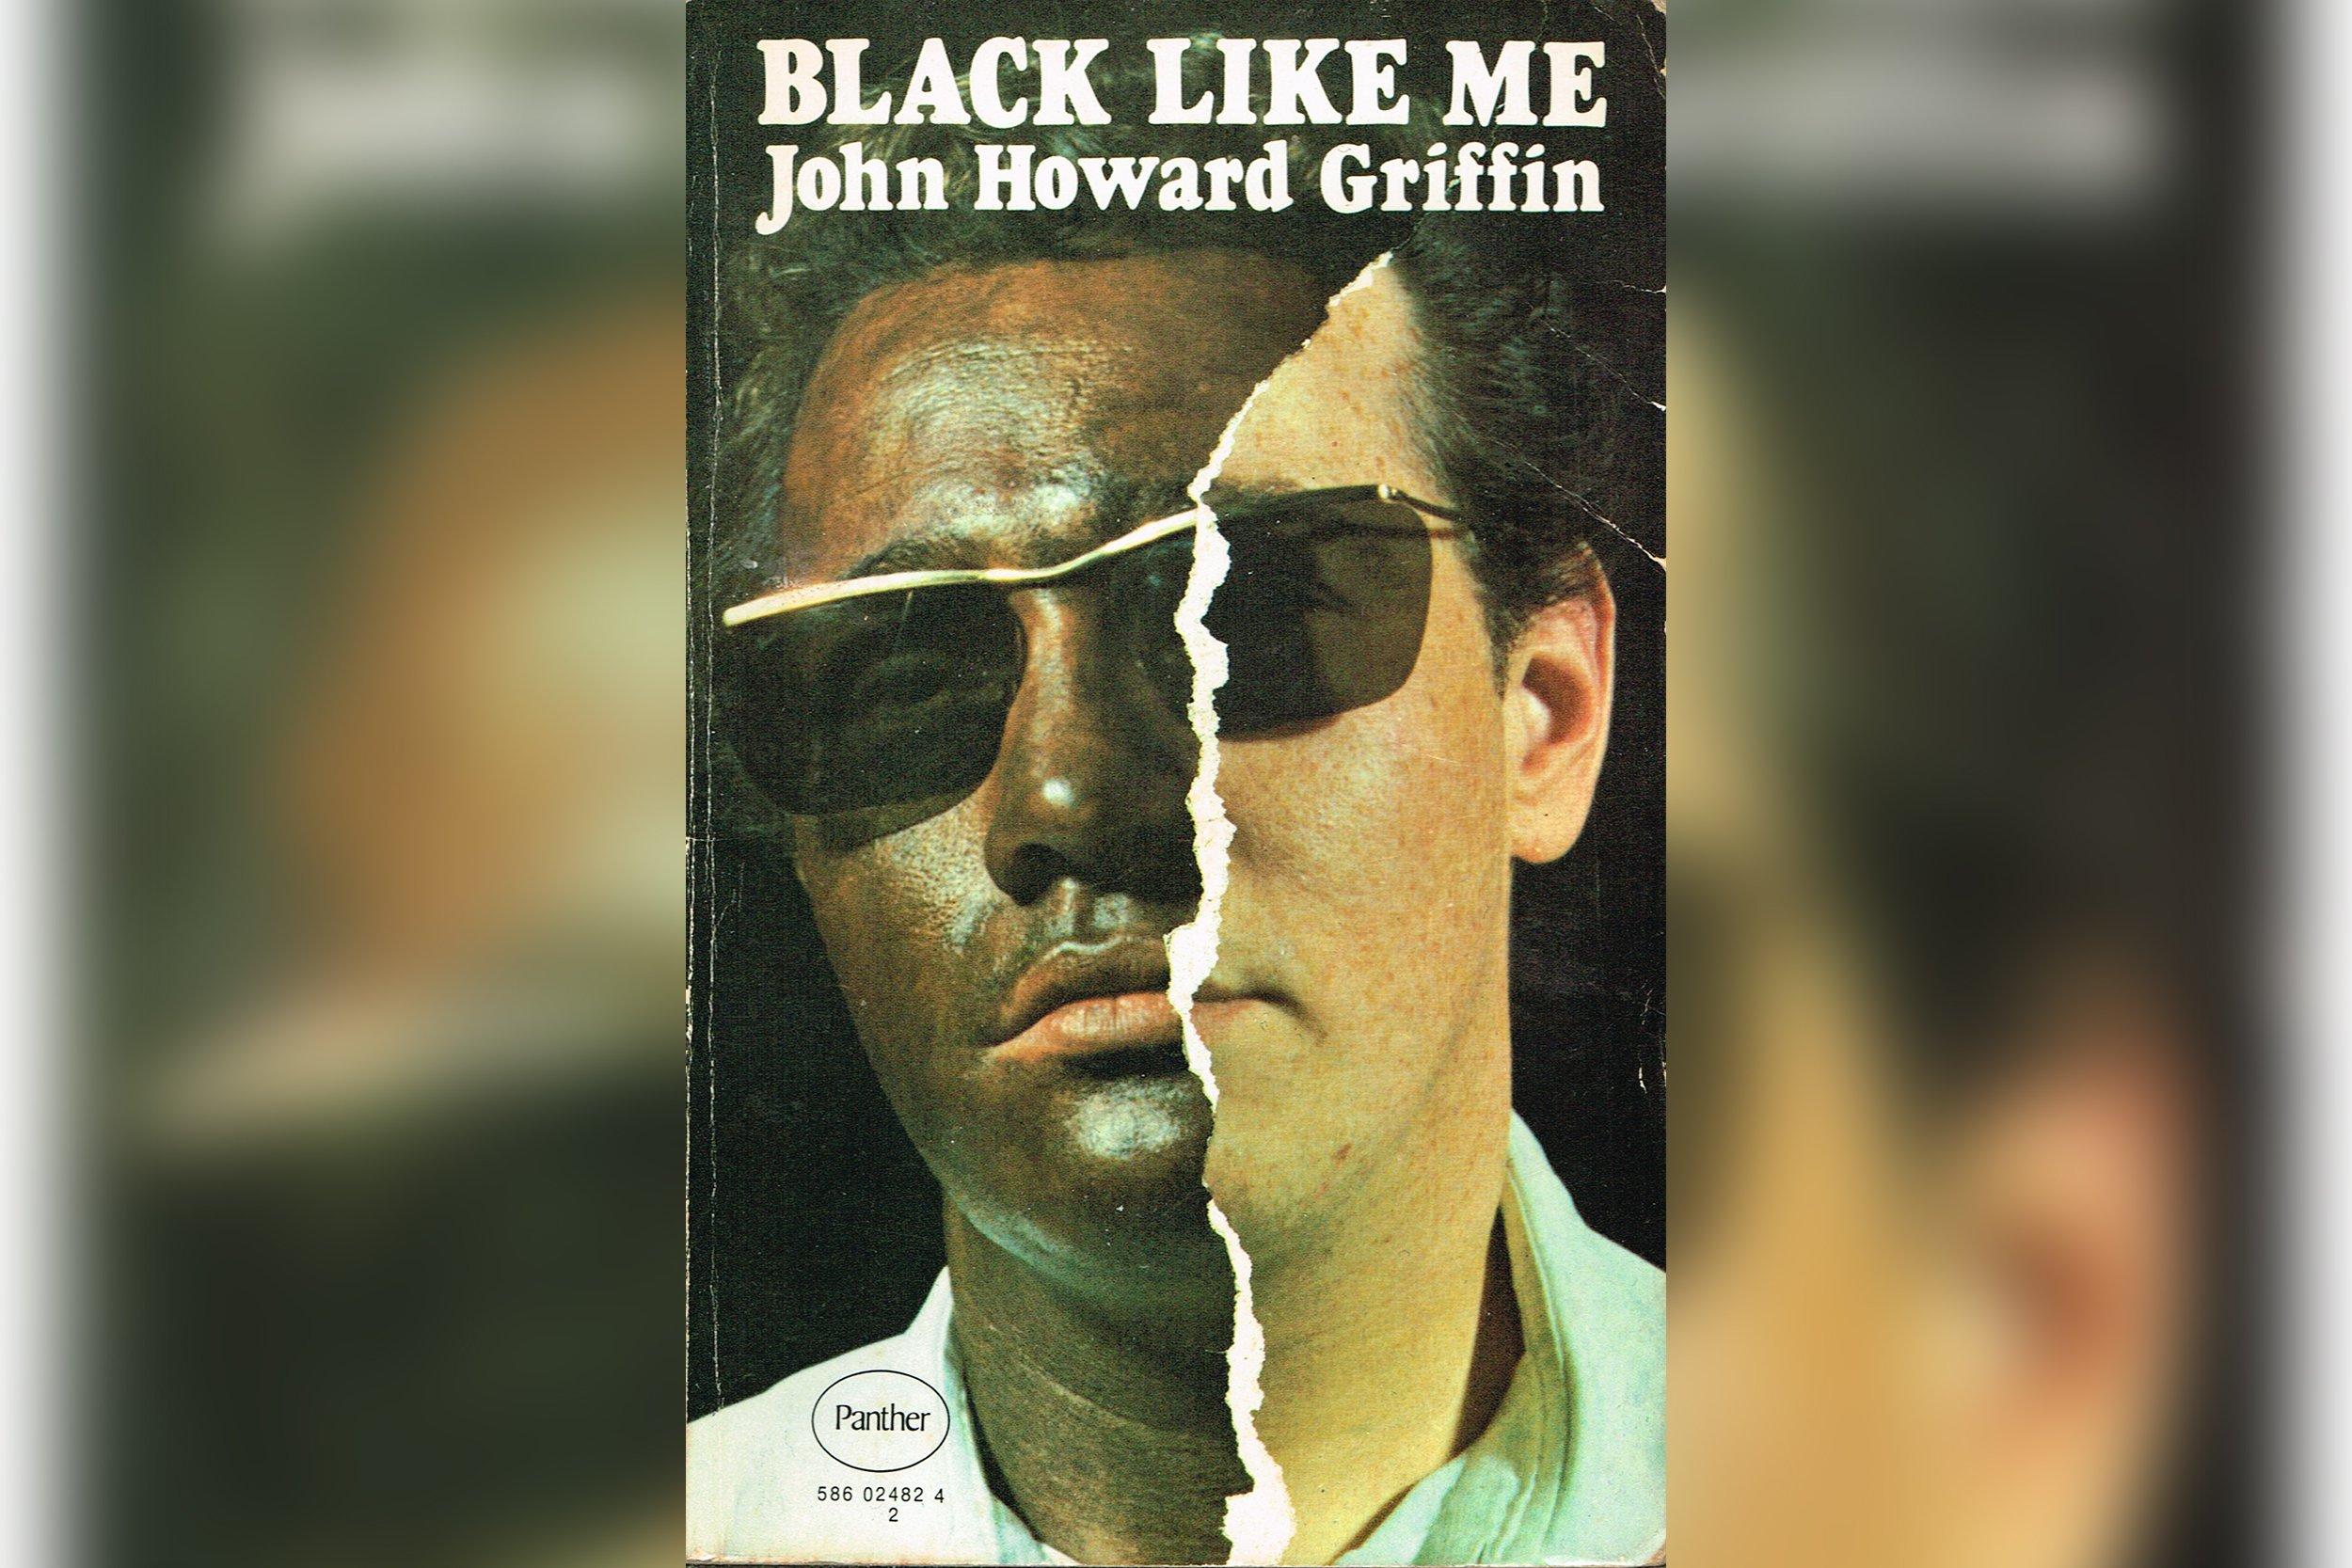 Black Like Me A White Man S Experience Of Segregation